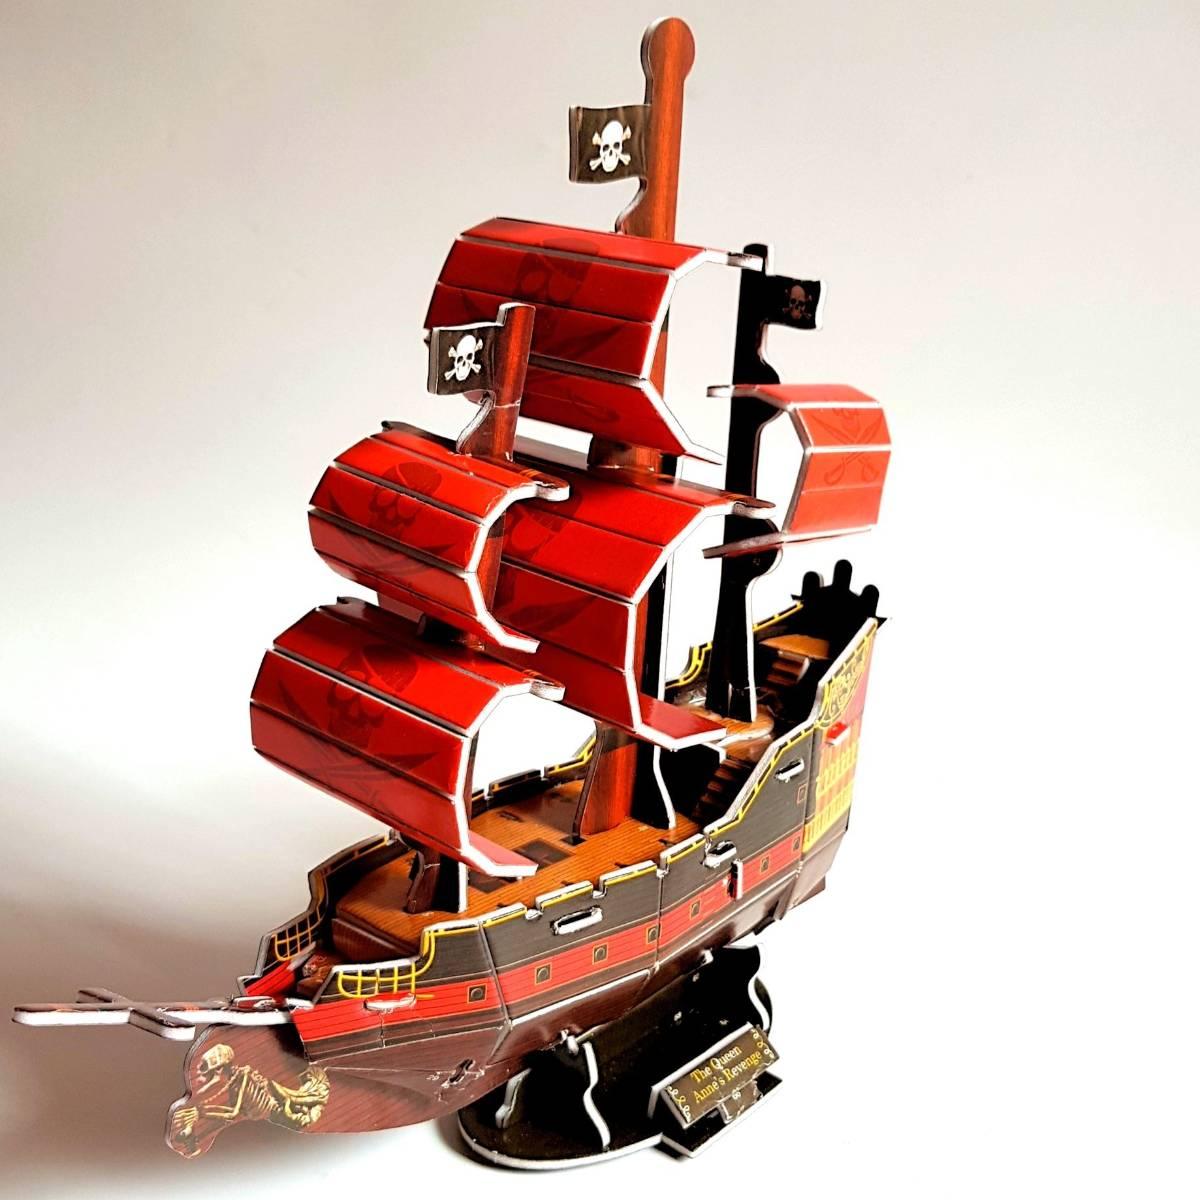 Mainan 3d Puzzle - Pirate Ship1